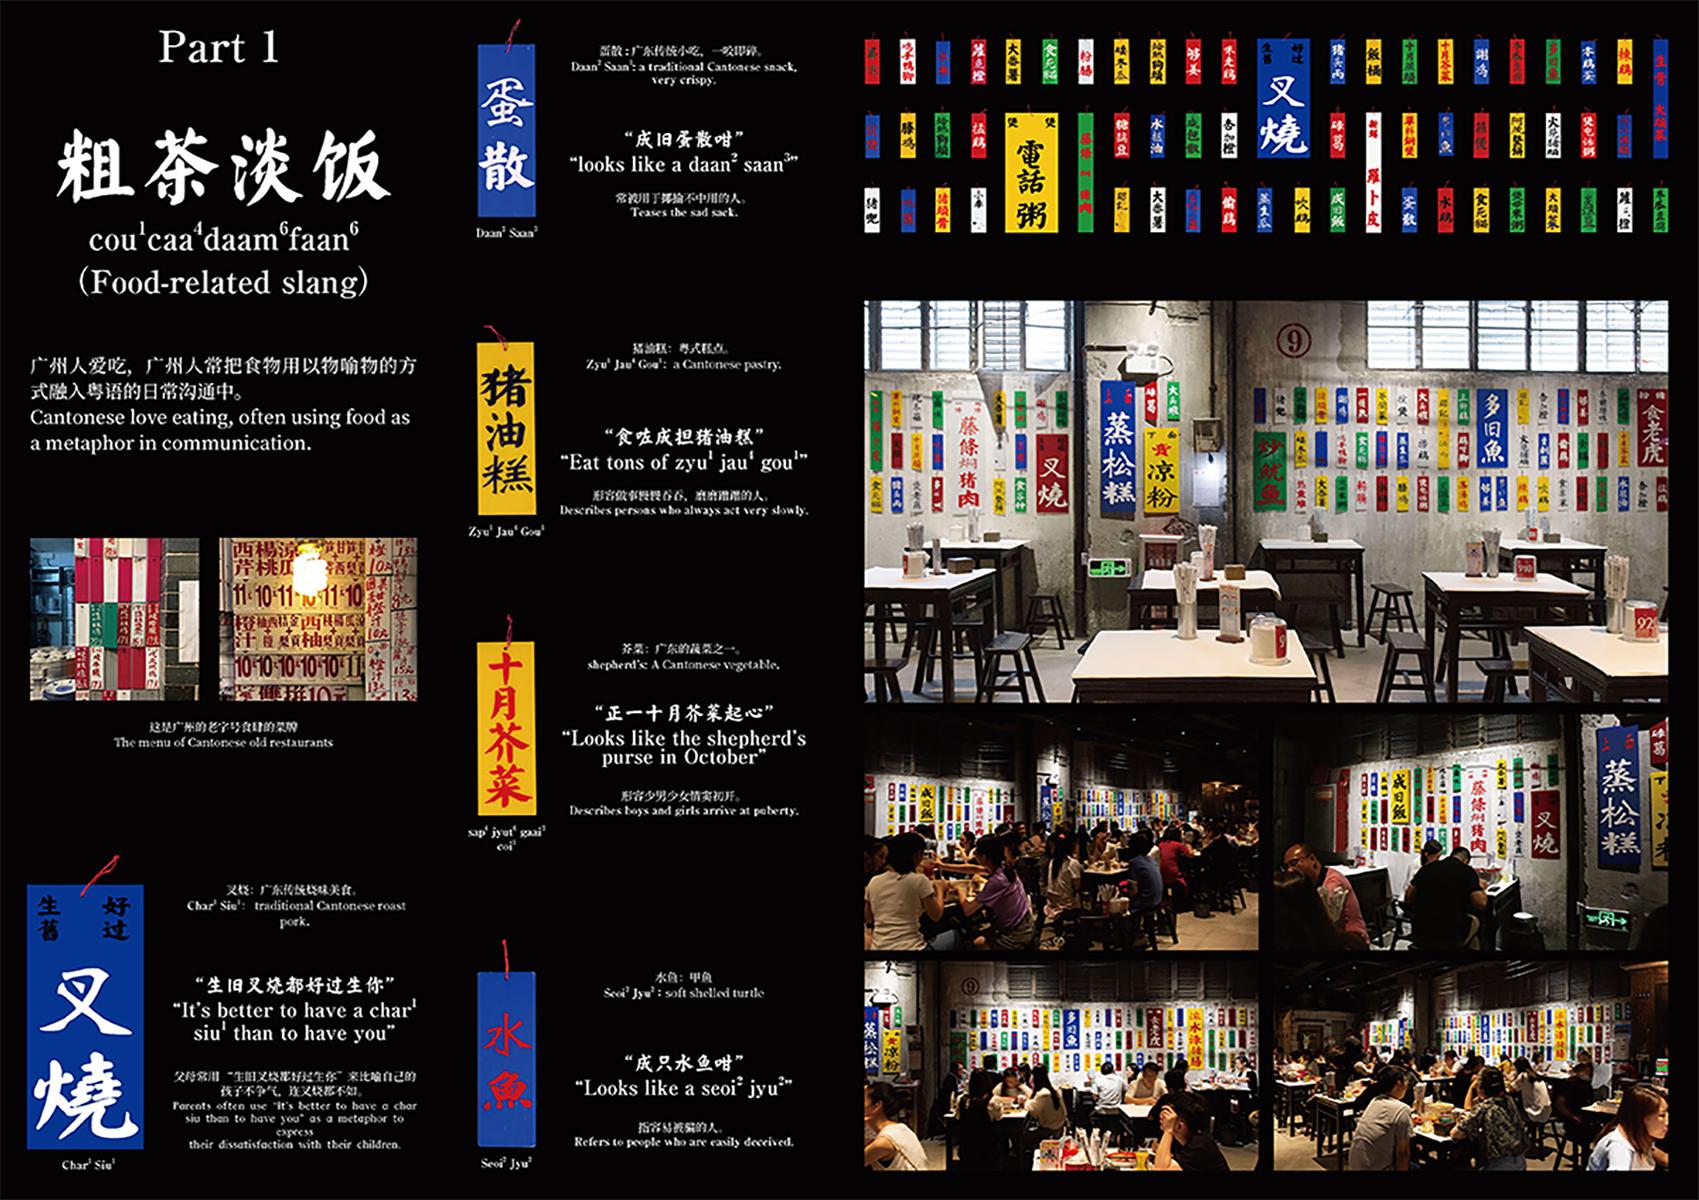 Liu Zhao + Zhan Huode + Weng Donghua|Góng Mē—Cantonese Observation Exhibition